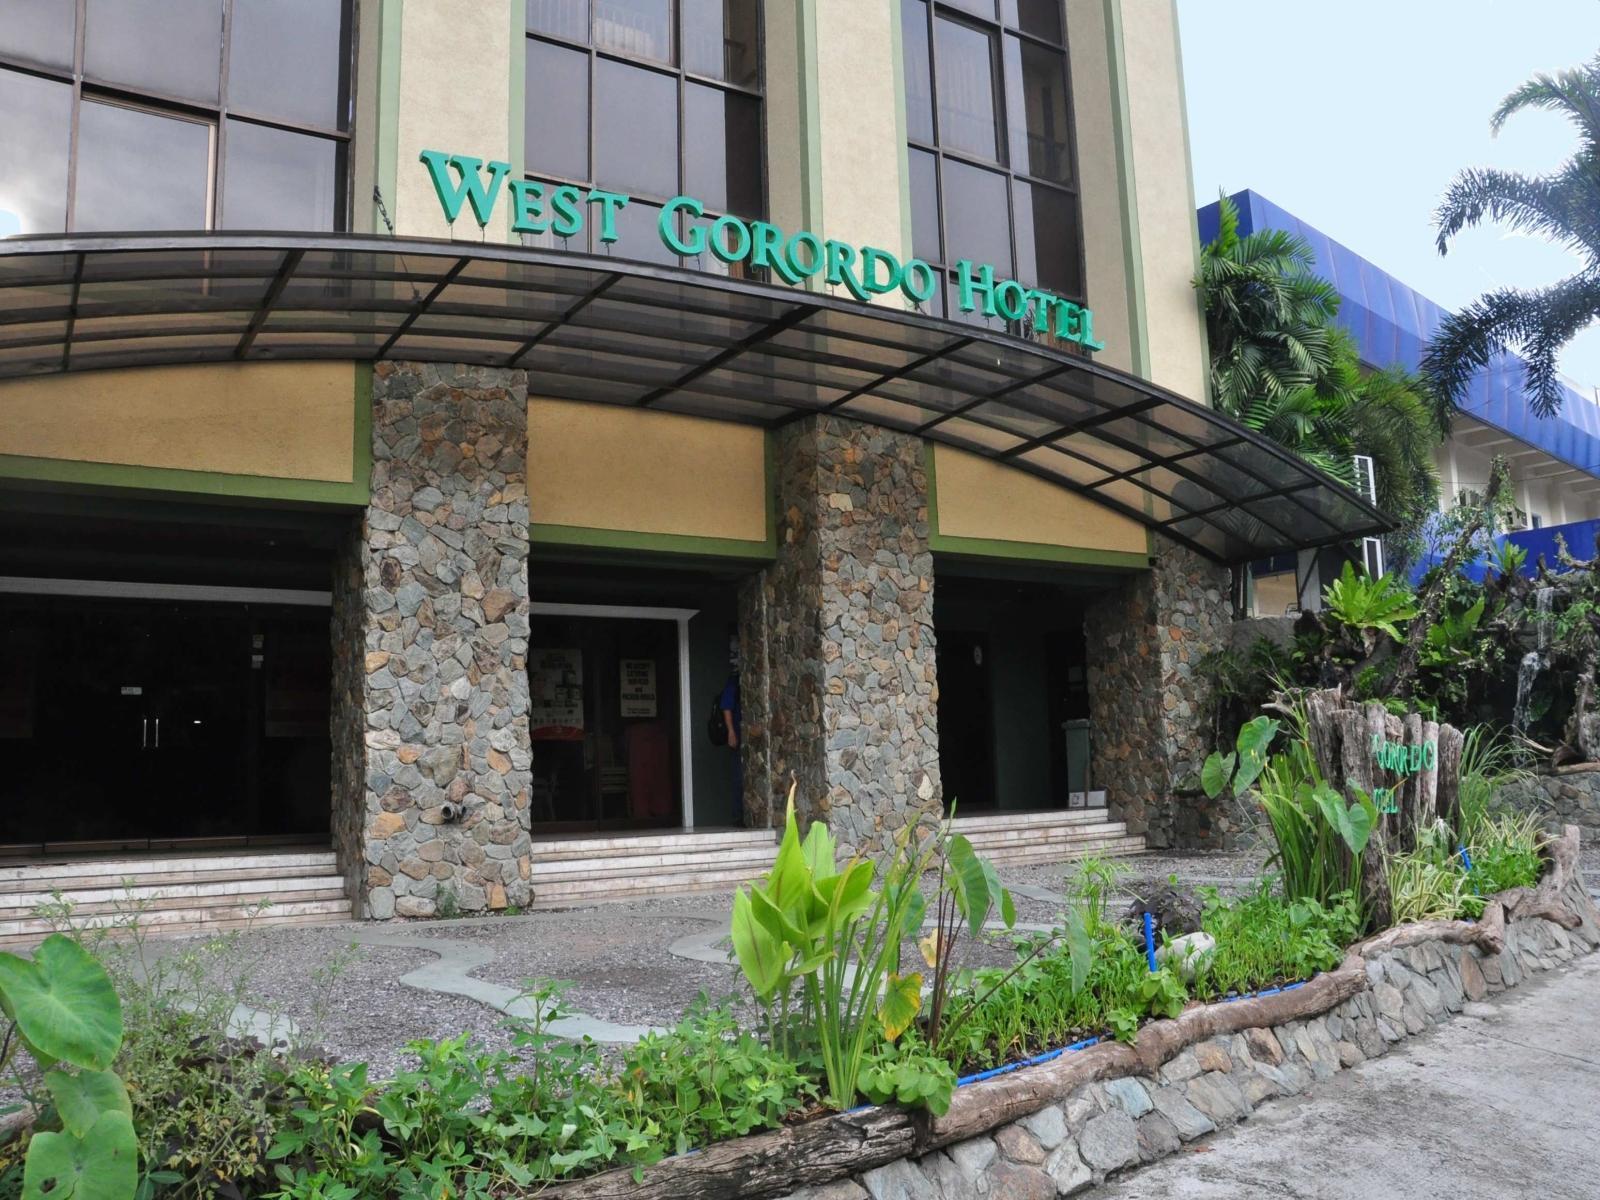 West Gorordo Hotel